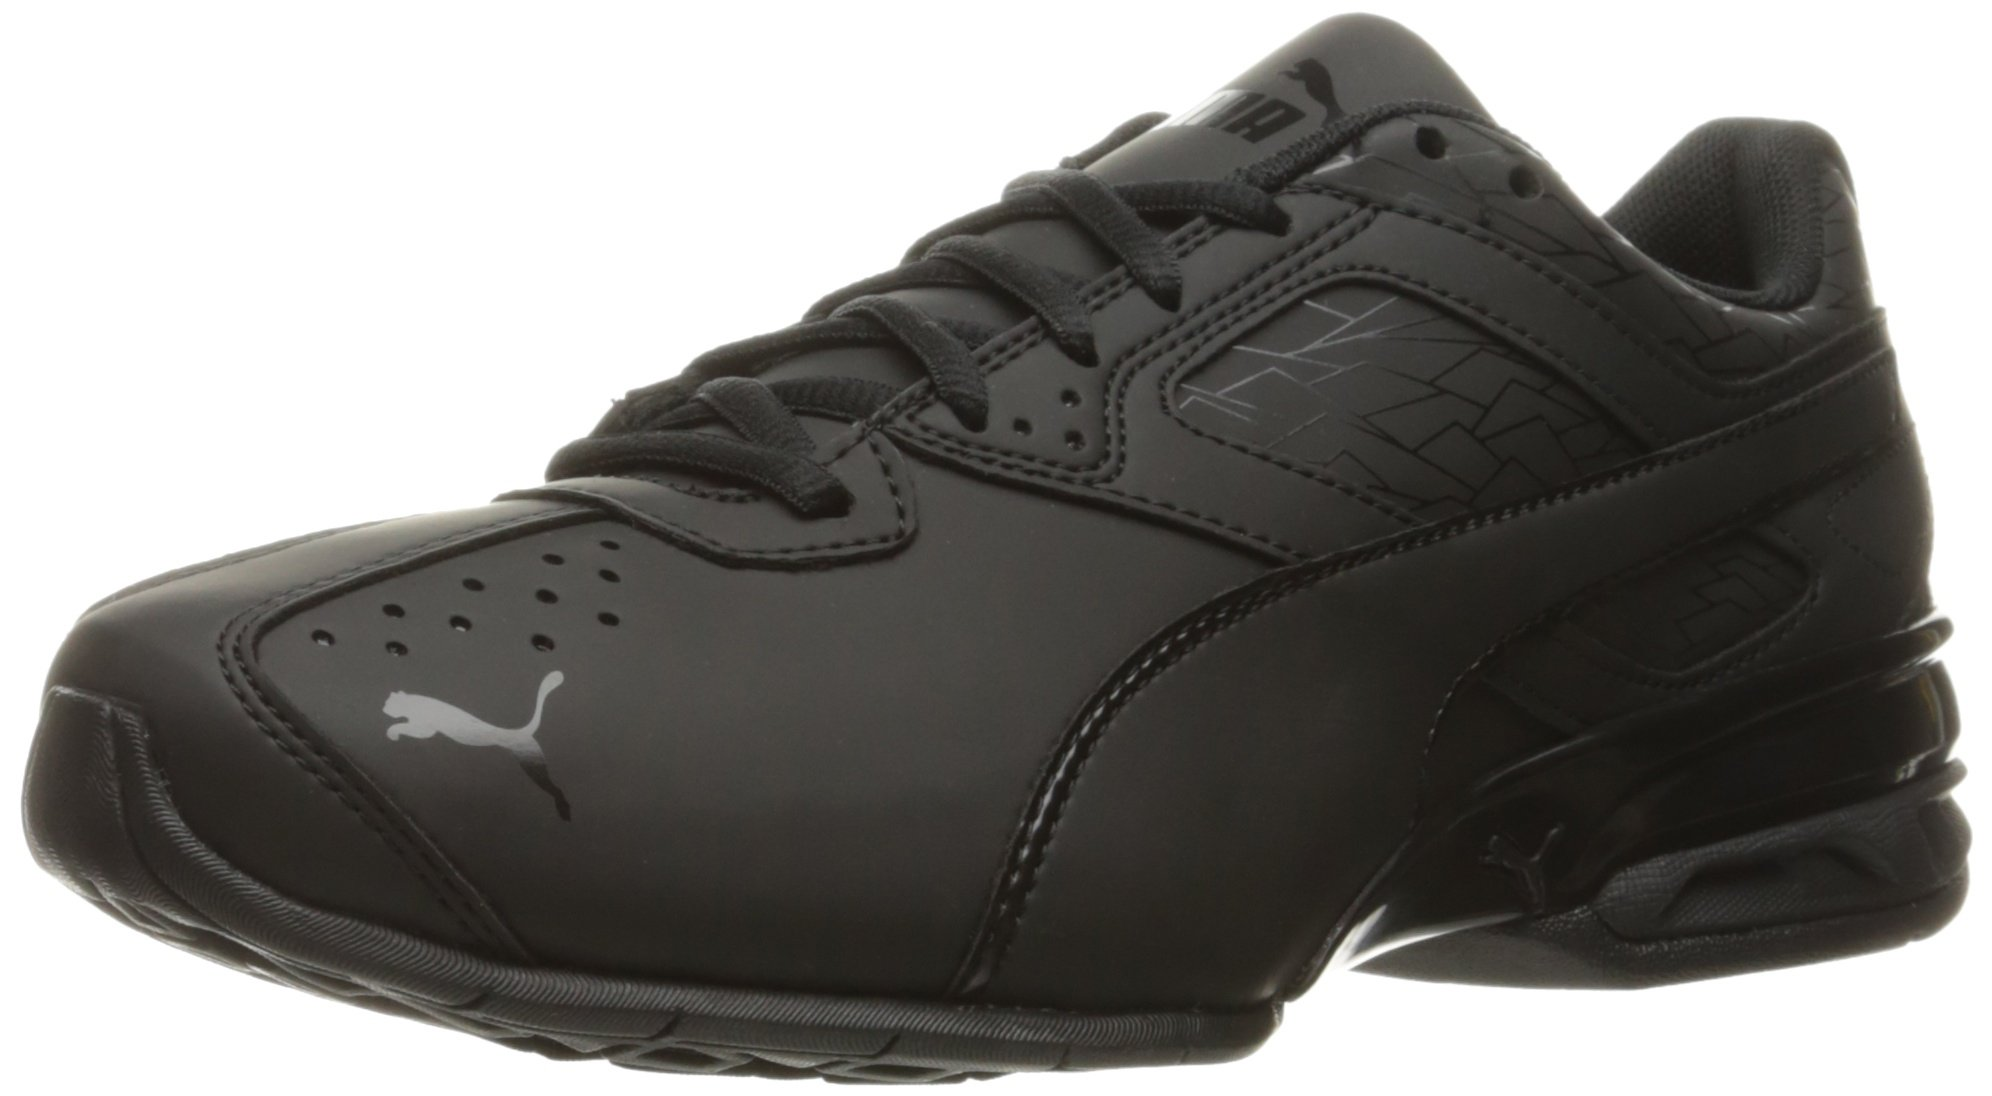 PUMA 男式 tazon 6fracture FM cross-trainer 鞋